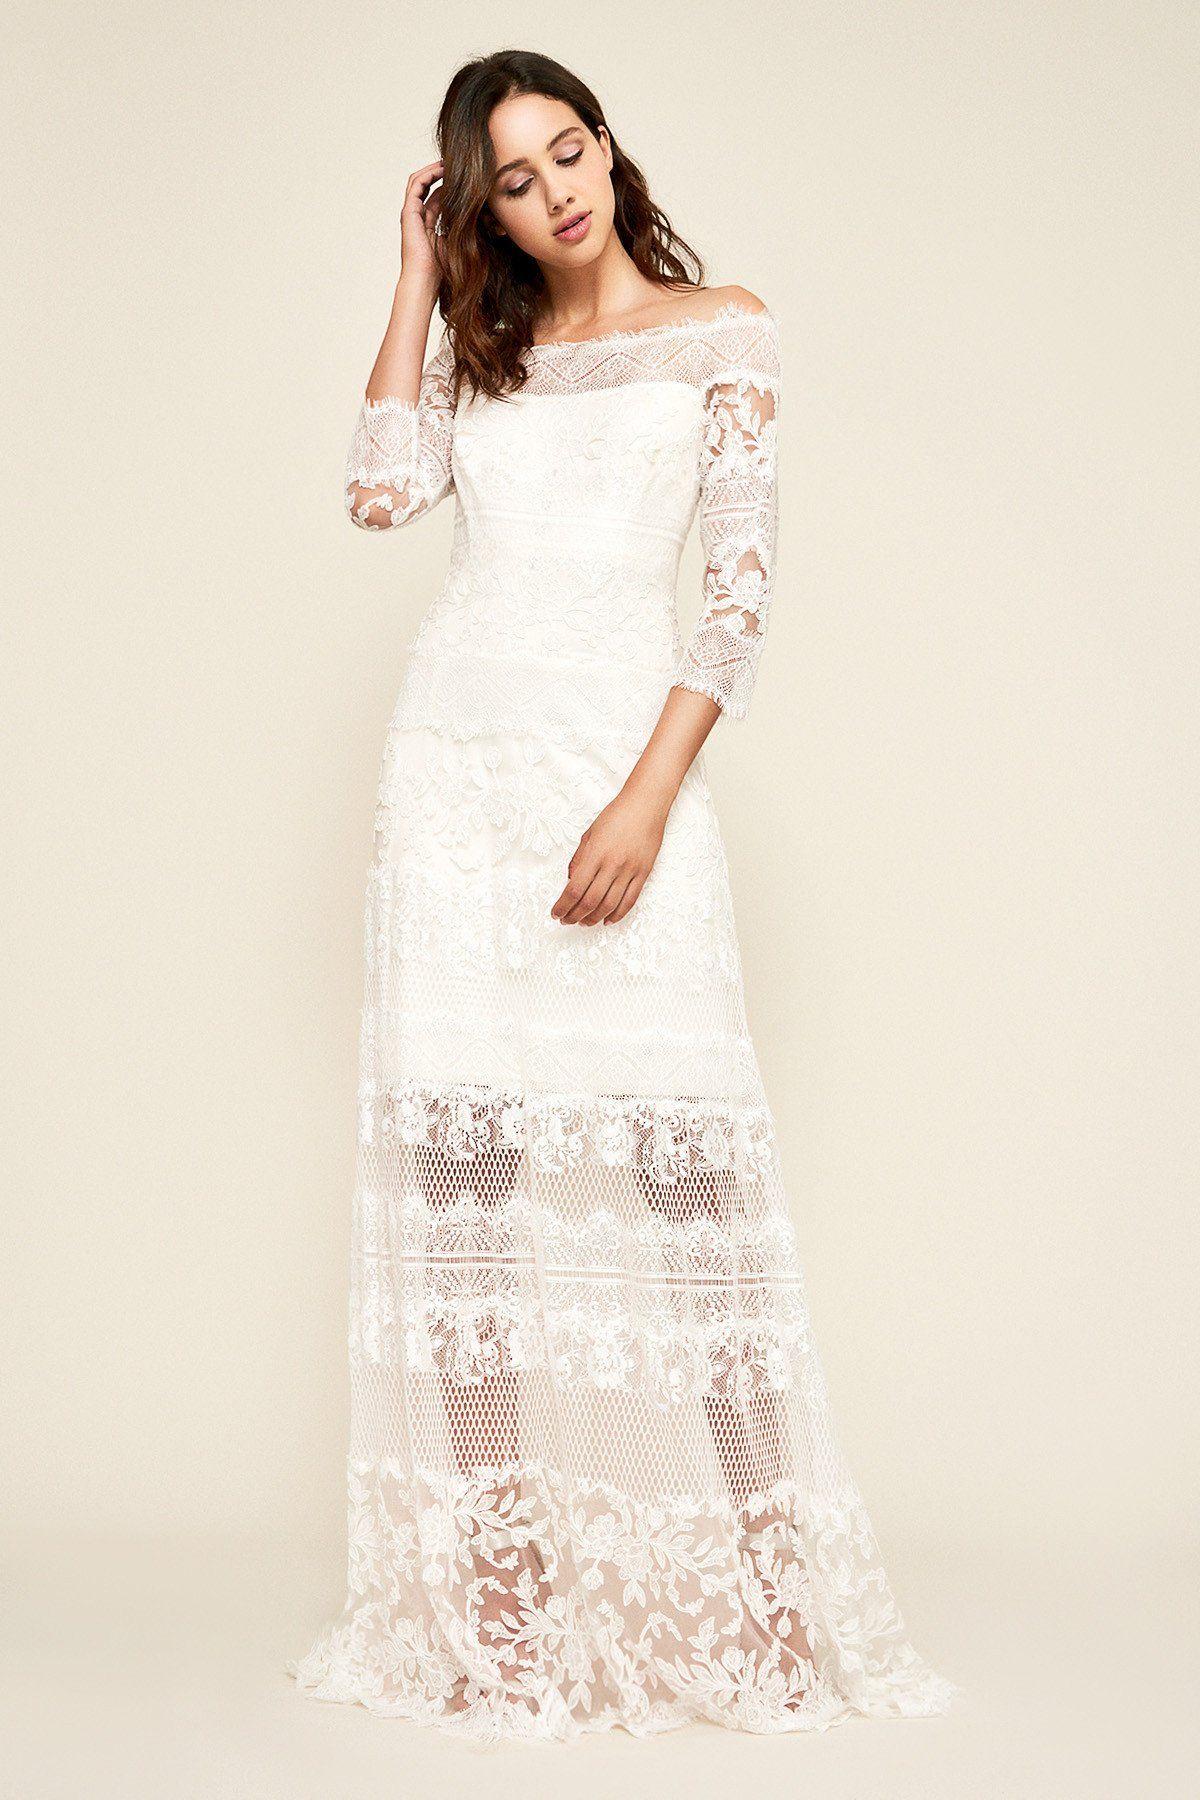 Tadashi Shoji Lace Off Shoulder Sheath Dress Plus Size Lace Dress Evening Dress Fashion Dresses [ 1800 x 1200 Pixel ]